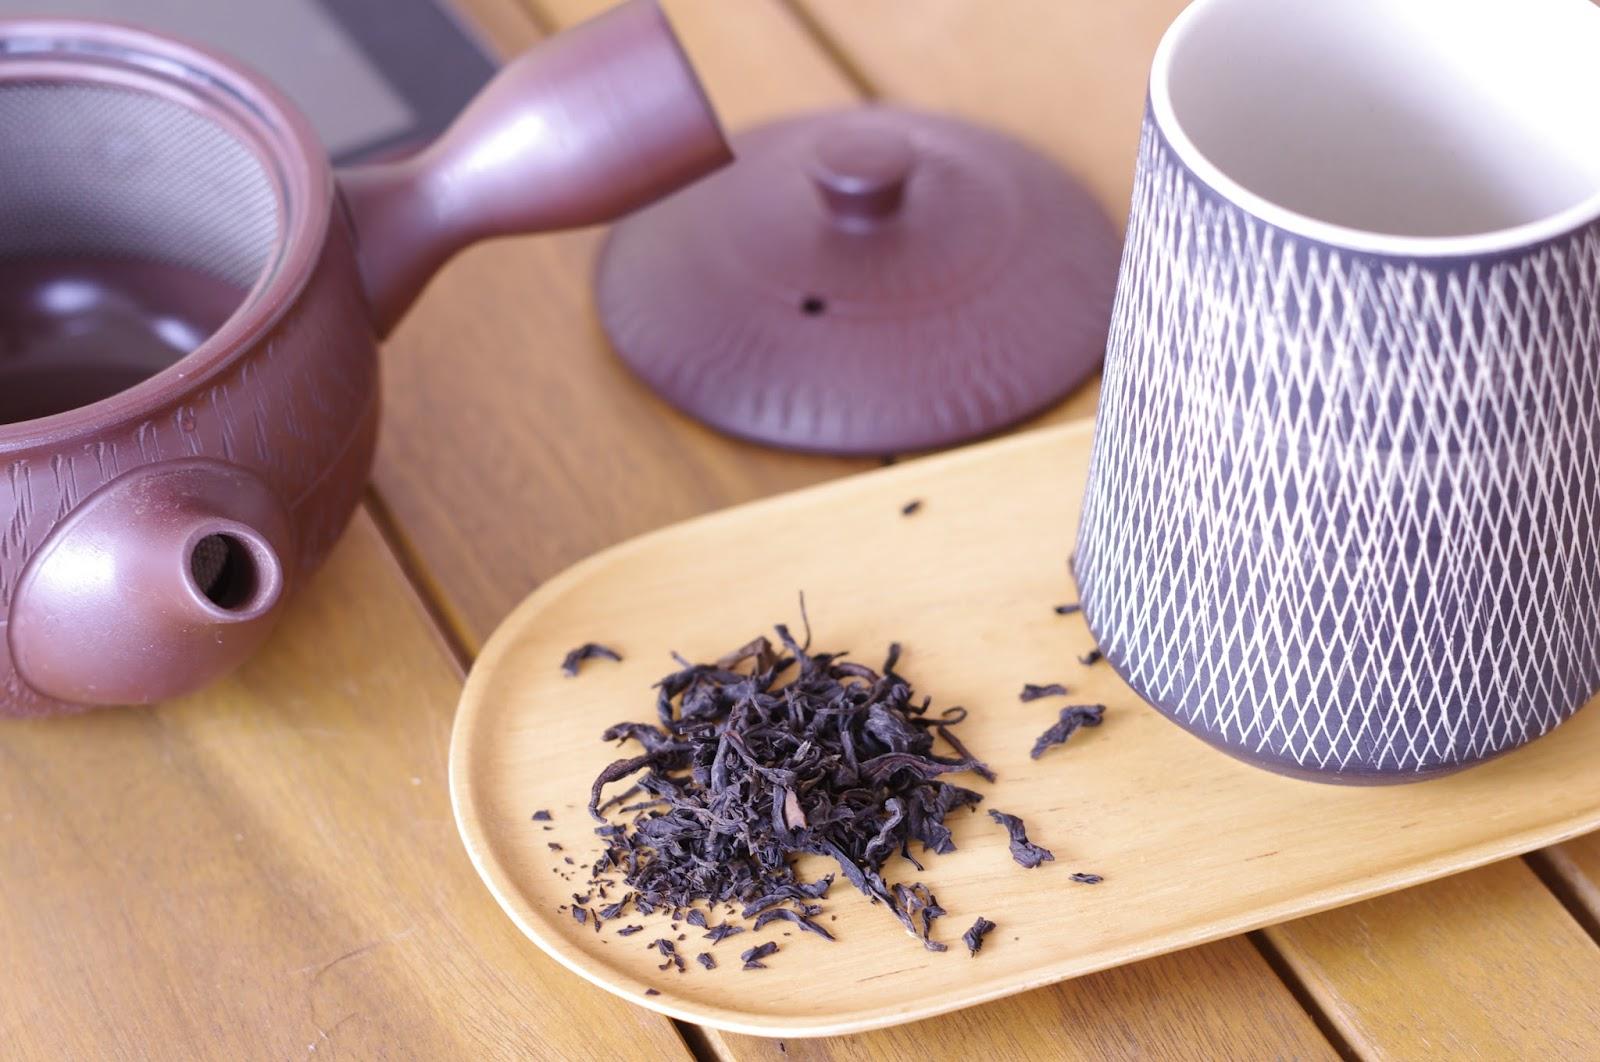 savourer le th test what cha georgia tamaz 39 s tiny tea factory black tea. Black Bedroom Furniture Sets. Home Design Ideas